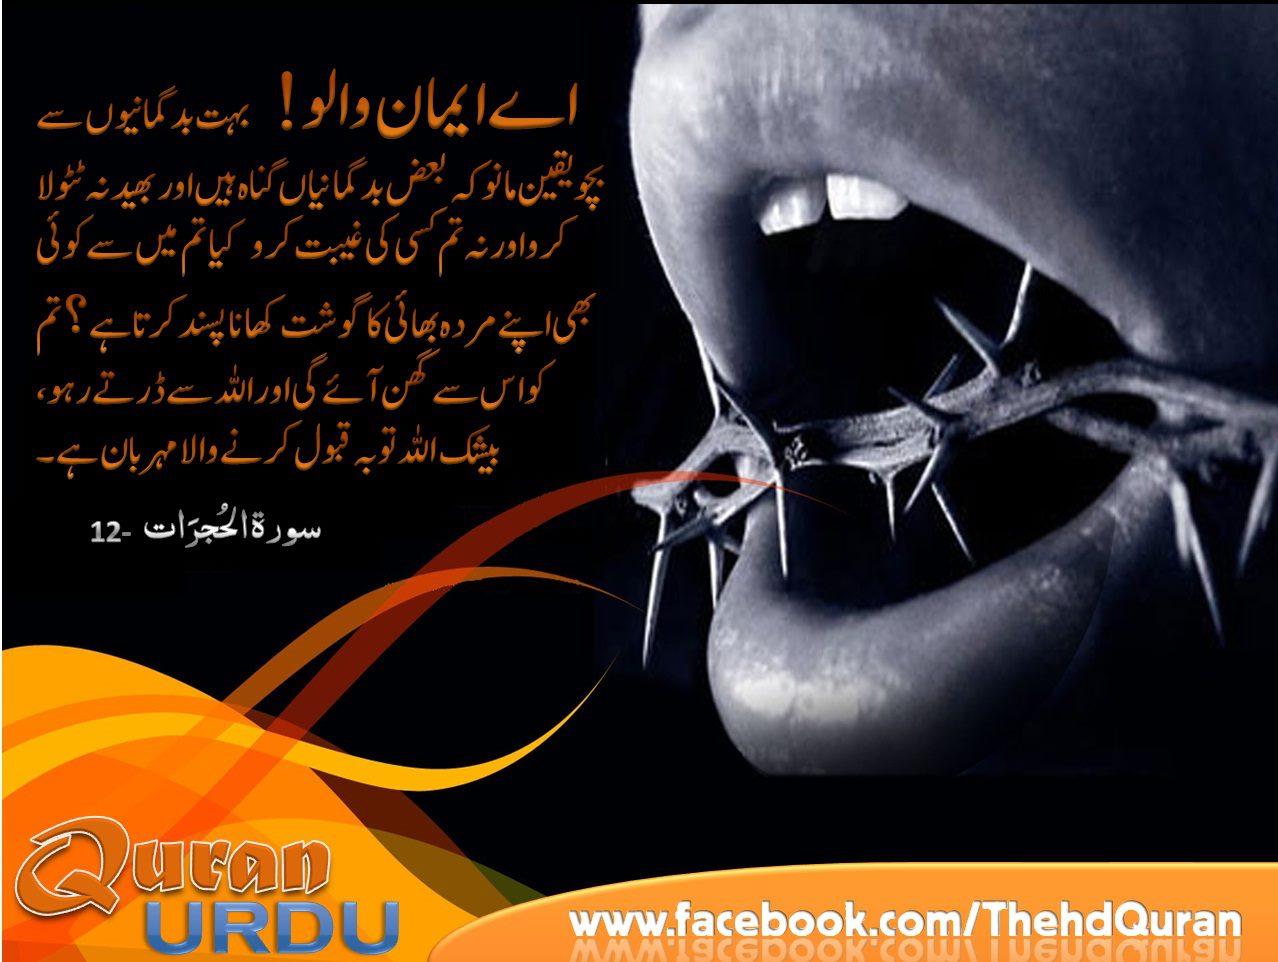 The HD Urdu Quran And Learn Islam 11 TM Islamic Wallpapers Islam11 LearnIslam11